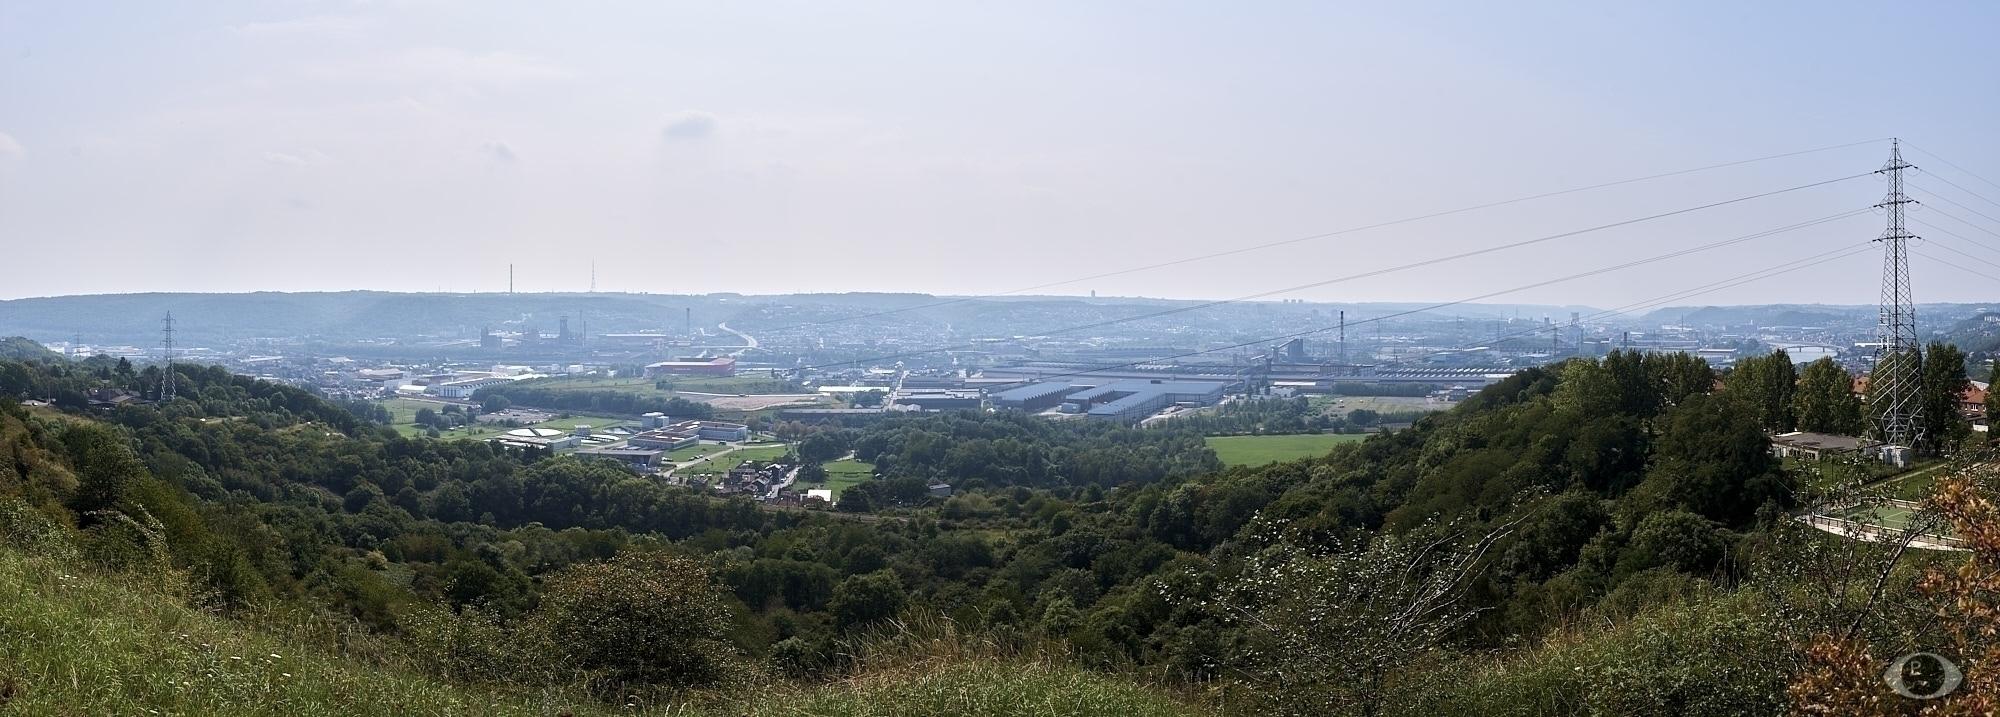 Arcelor steel site, Seraing for - pentaxke   ello